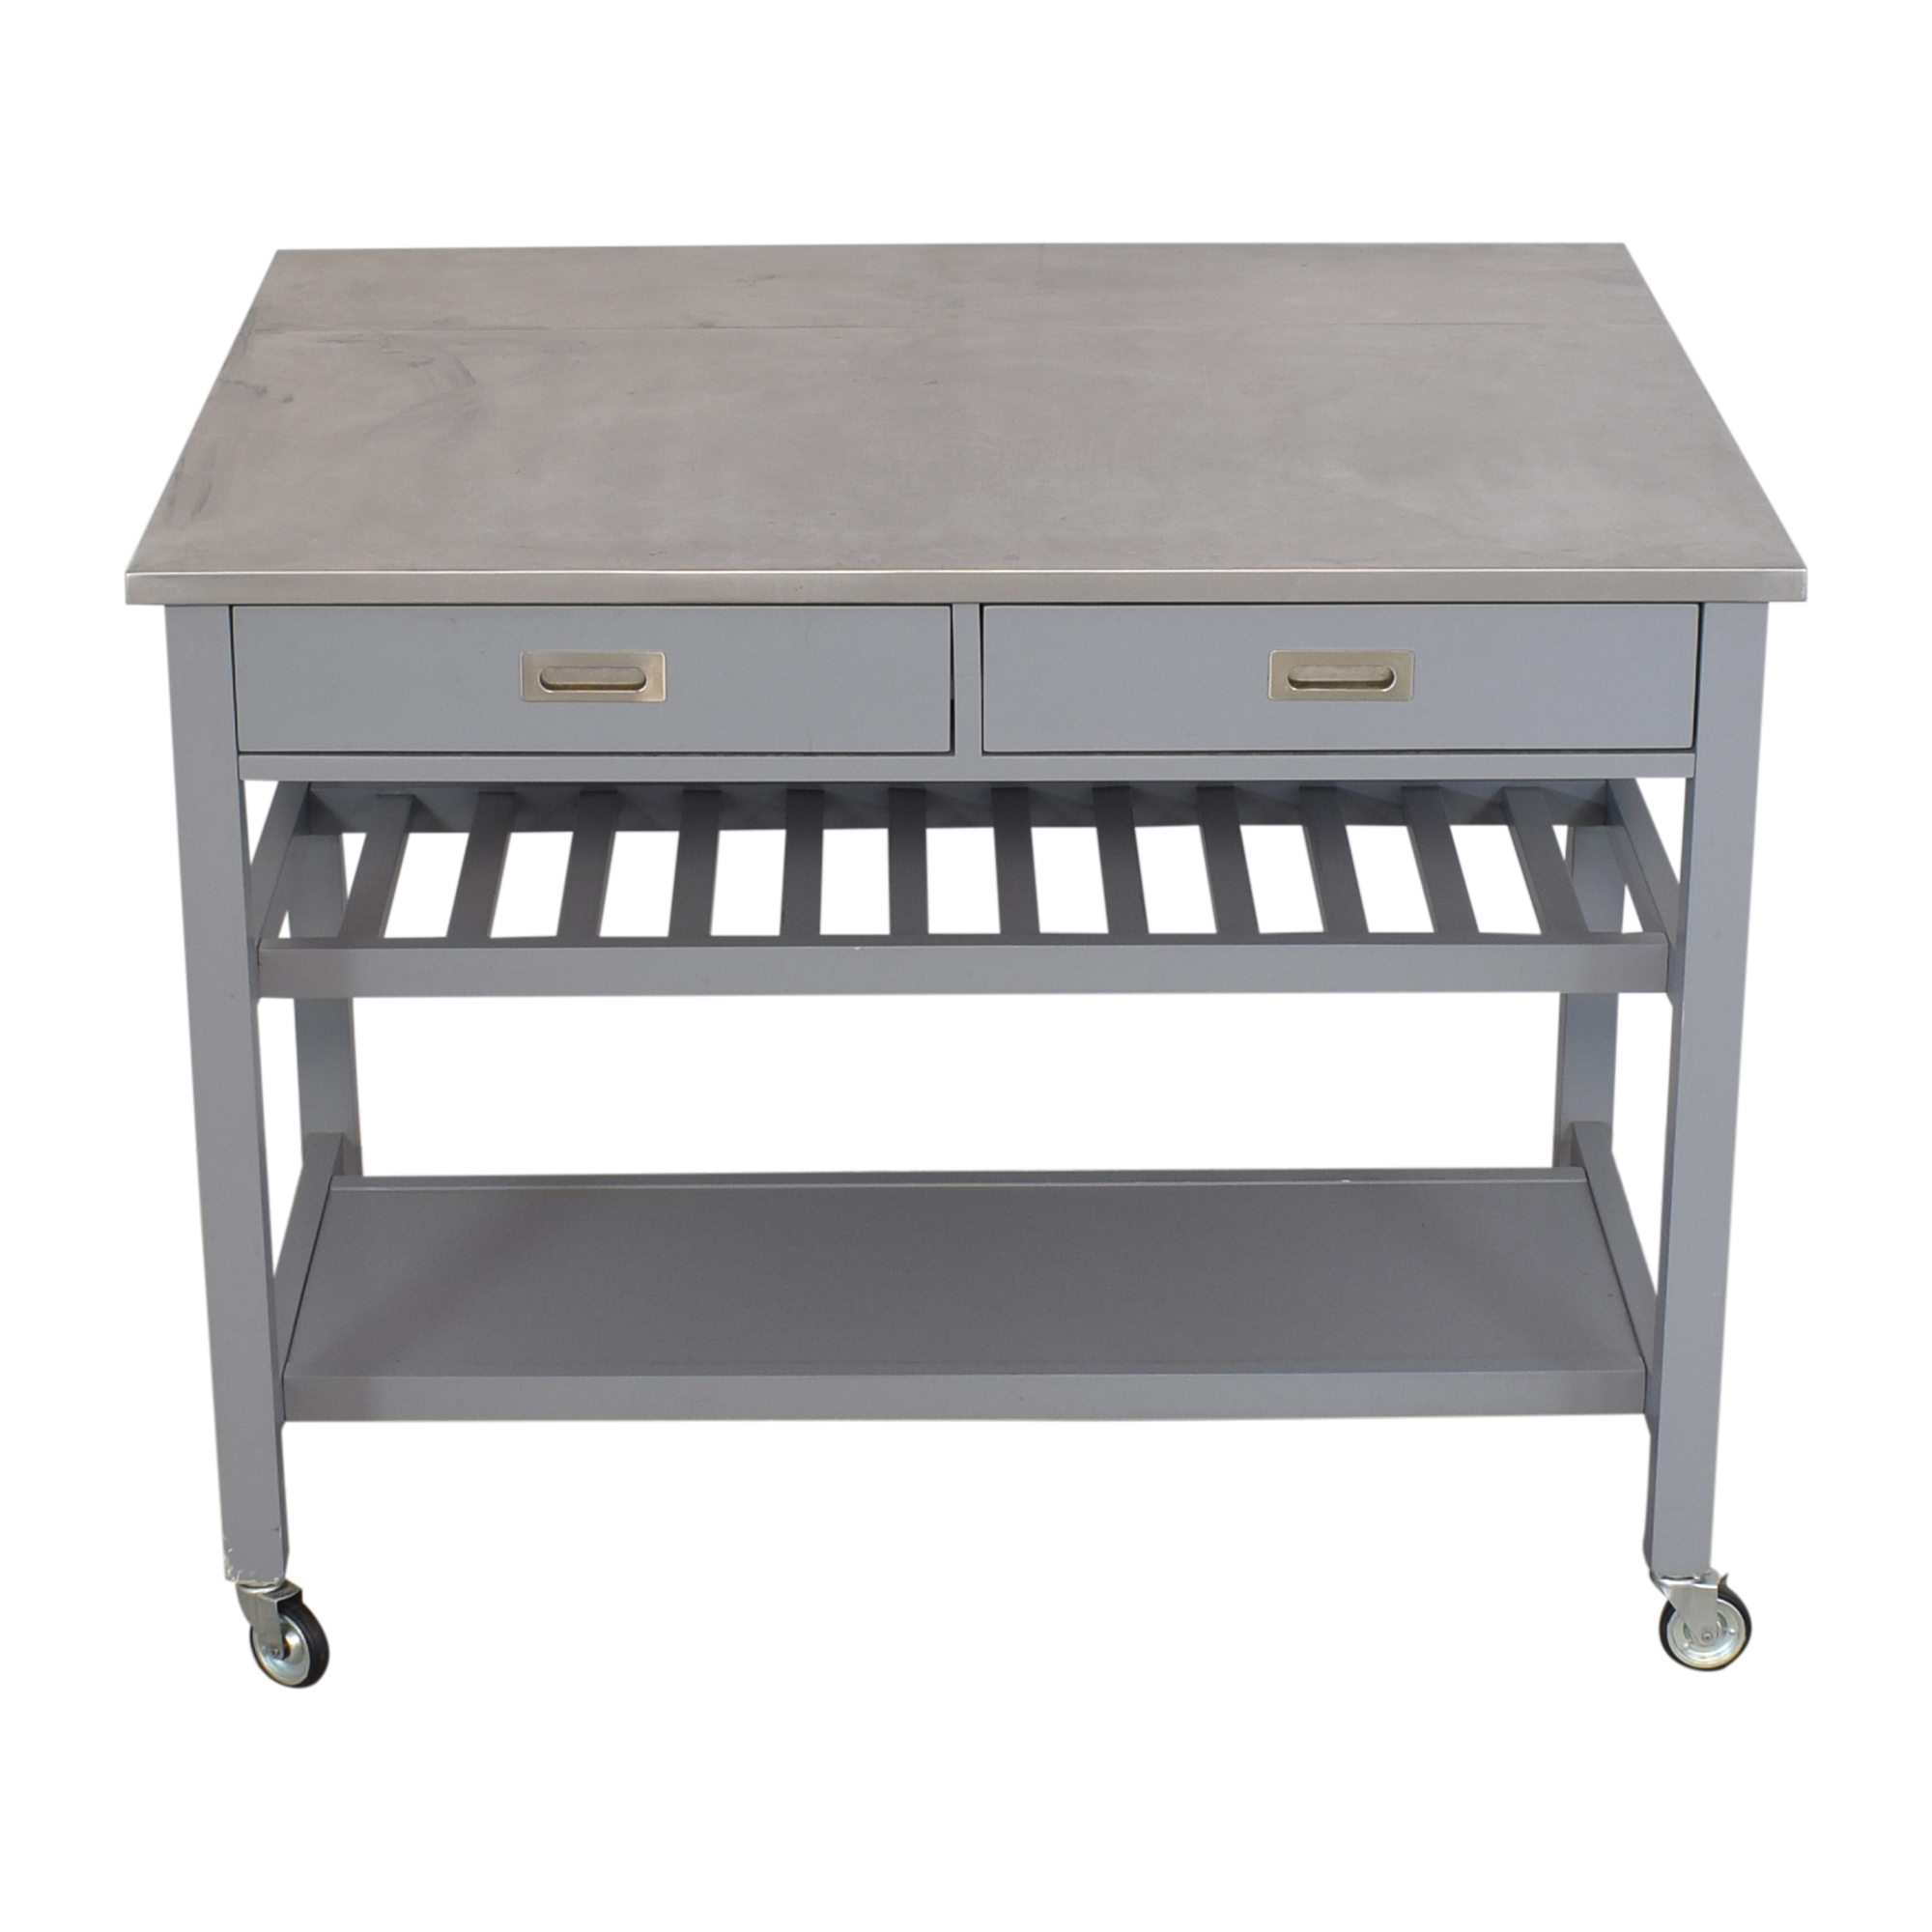 buy Crate & Barrel Belmont Open Kitchen Island Crate & Barrel Tables